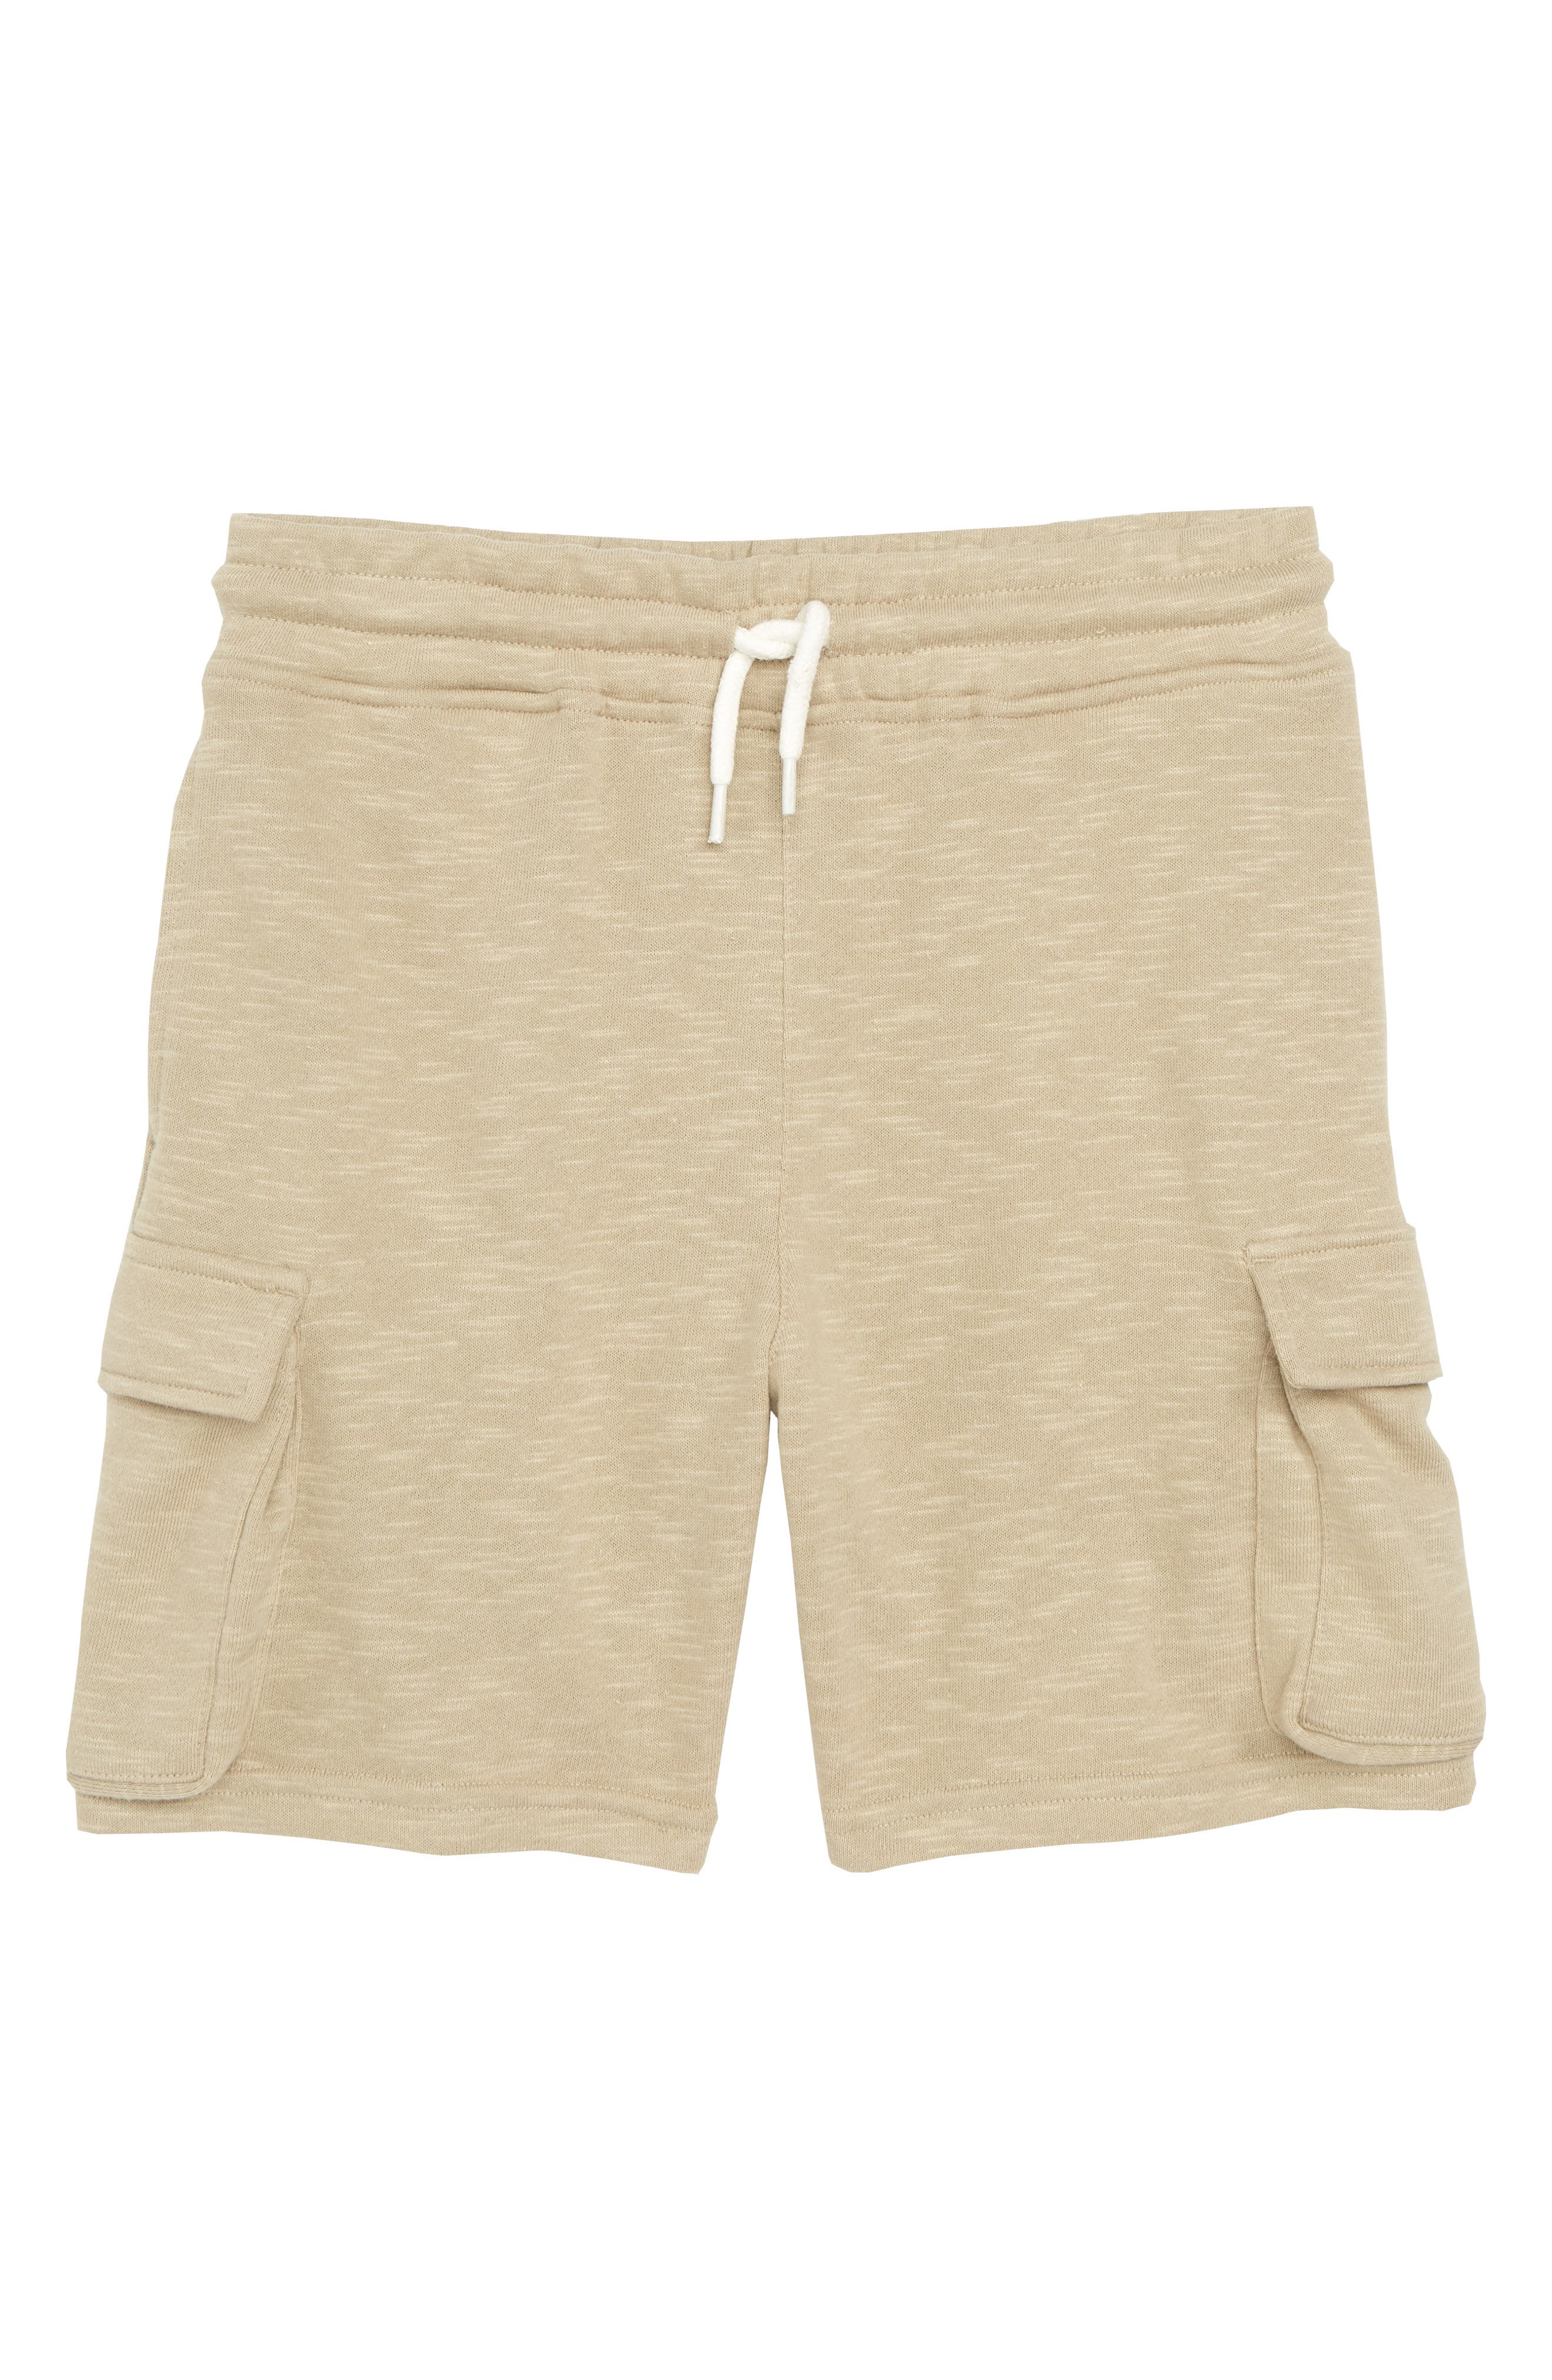 Cargo Shorts,                             Main thumbnail 1, color,                             SAND